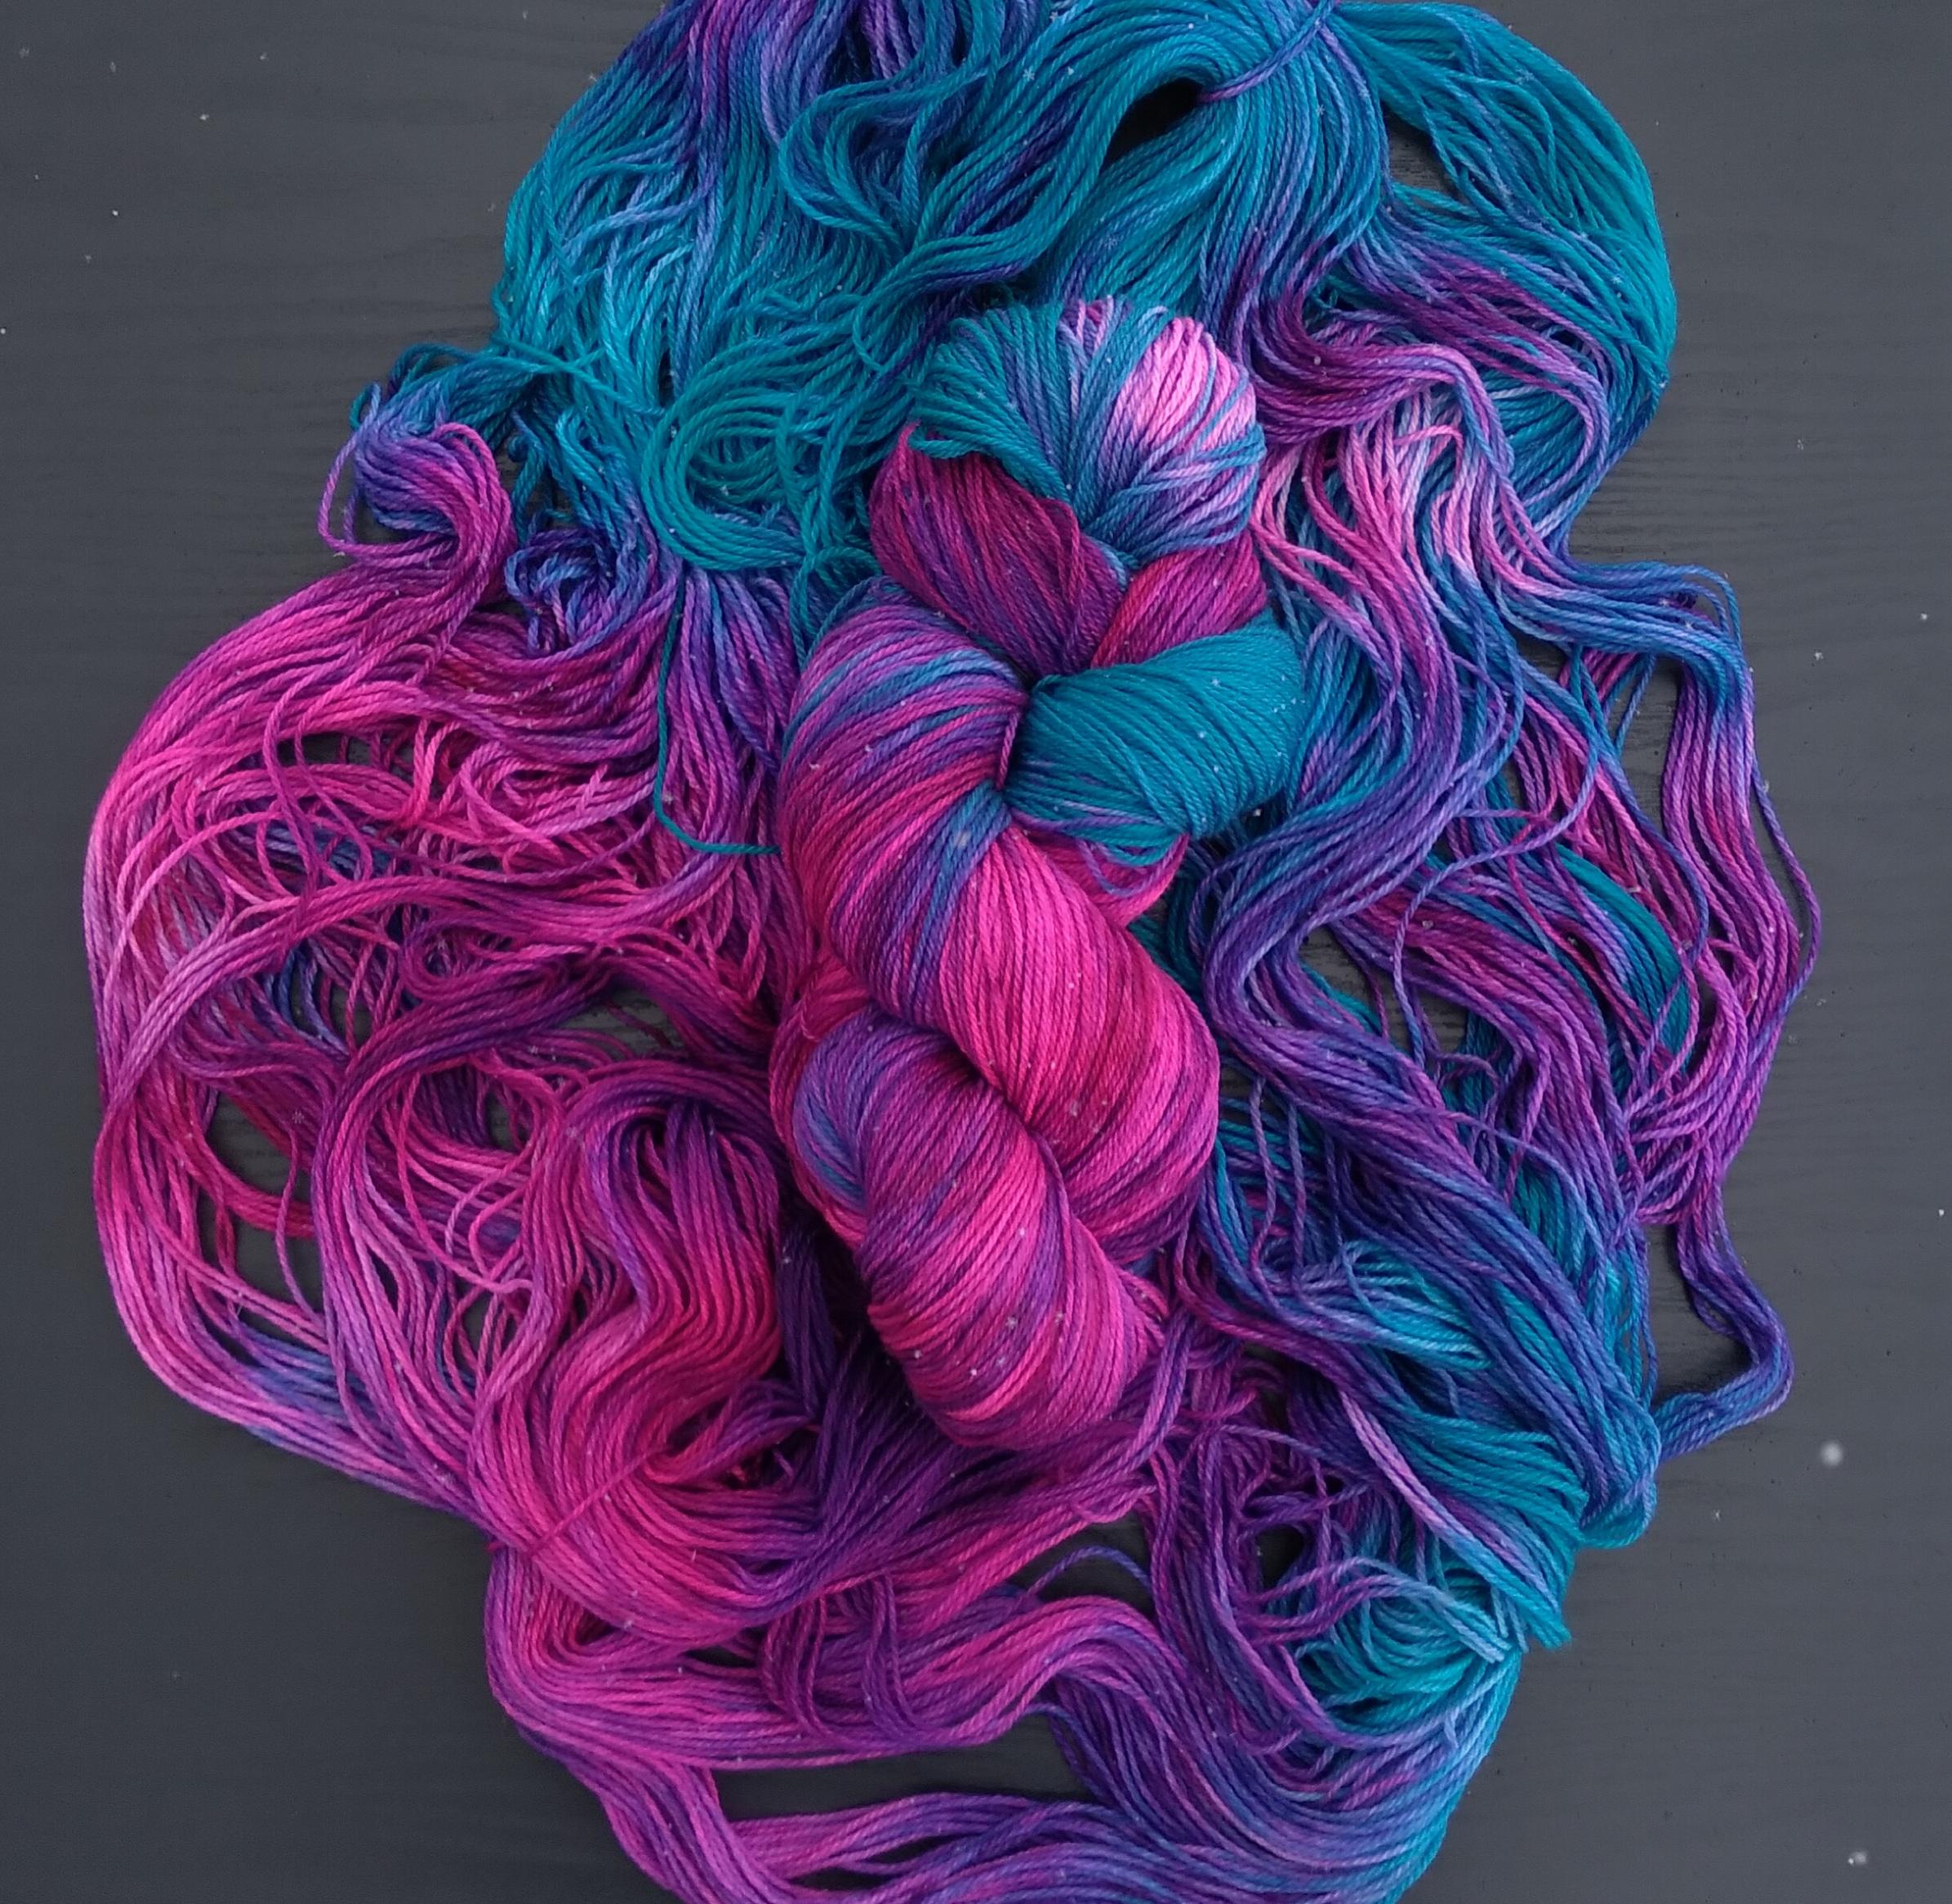 Blue pink and purple yarn bundle